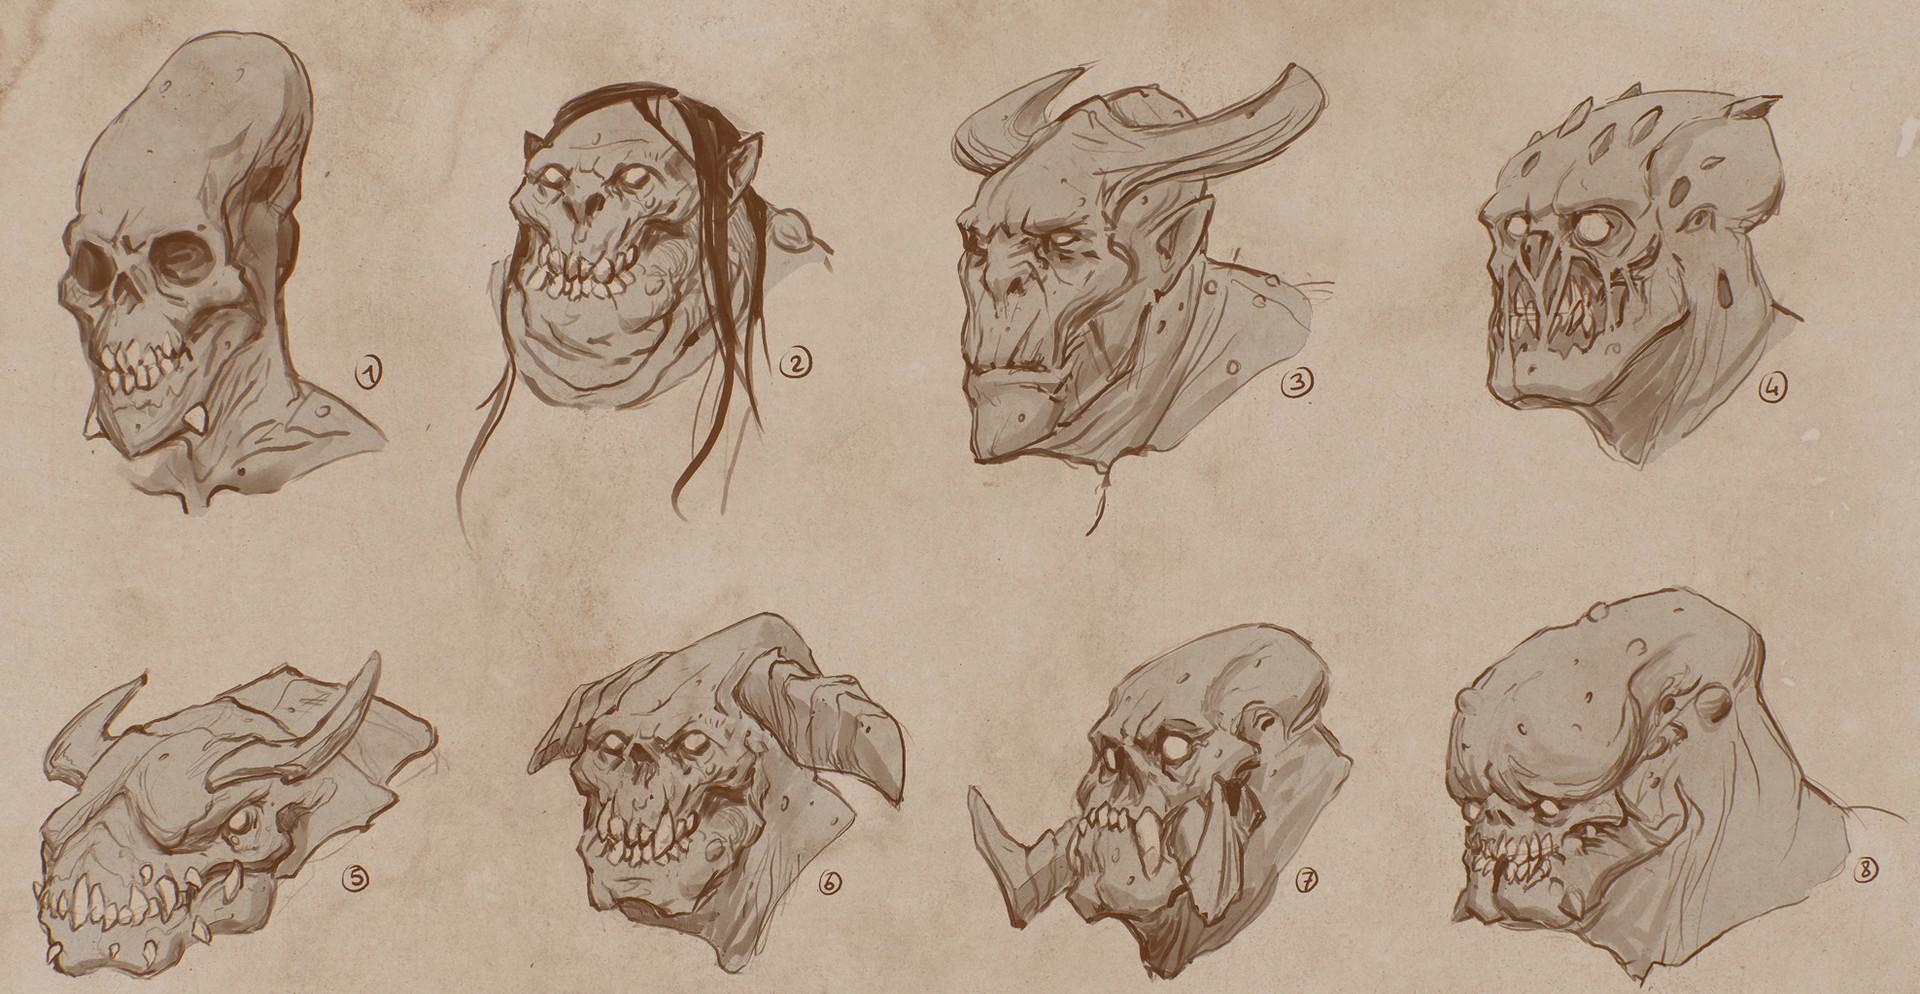 Maxence burgel sketchs 1